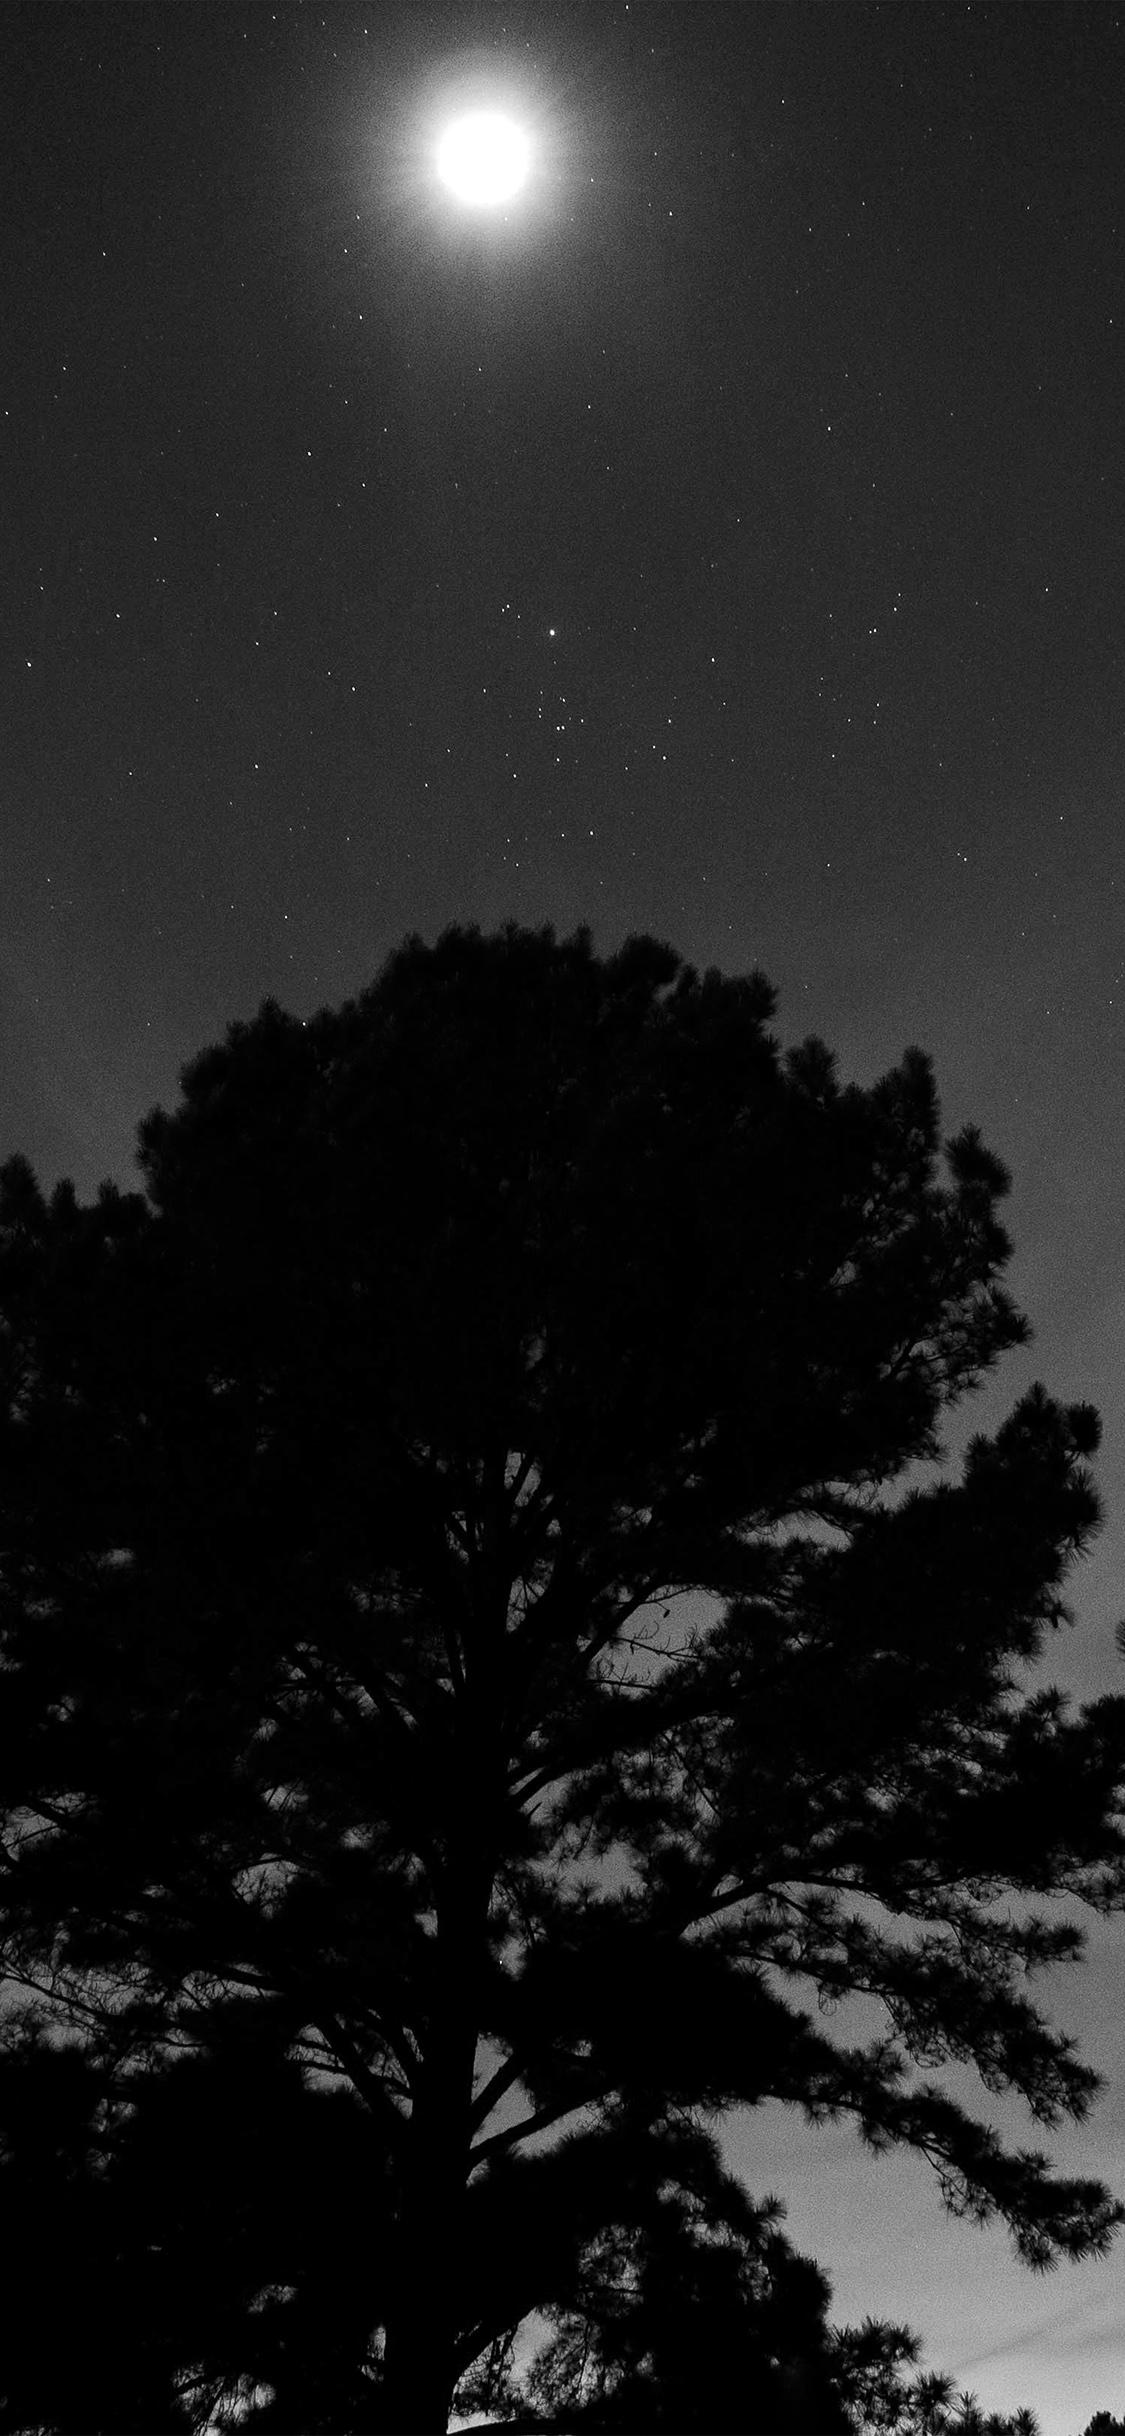 Papers Co Iphone Wallpaper Nj69 One Star Shine Night Dark Sky